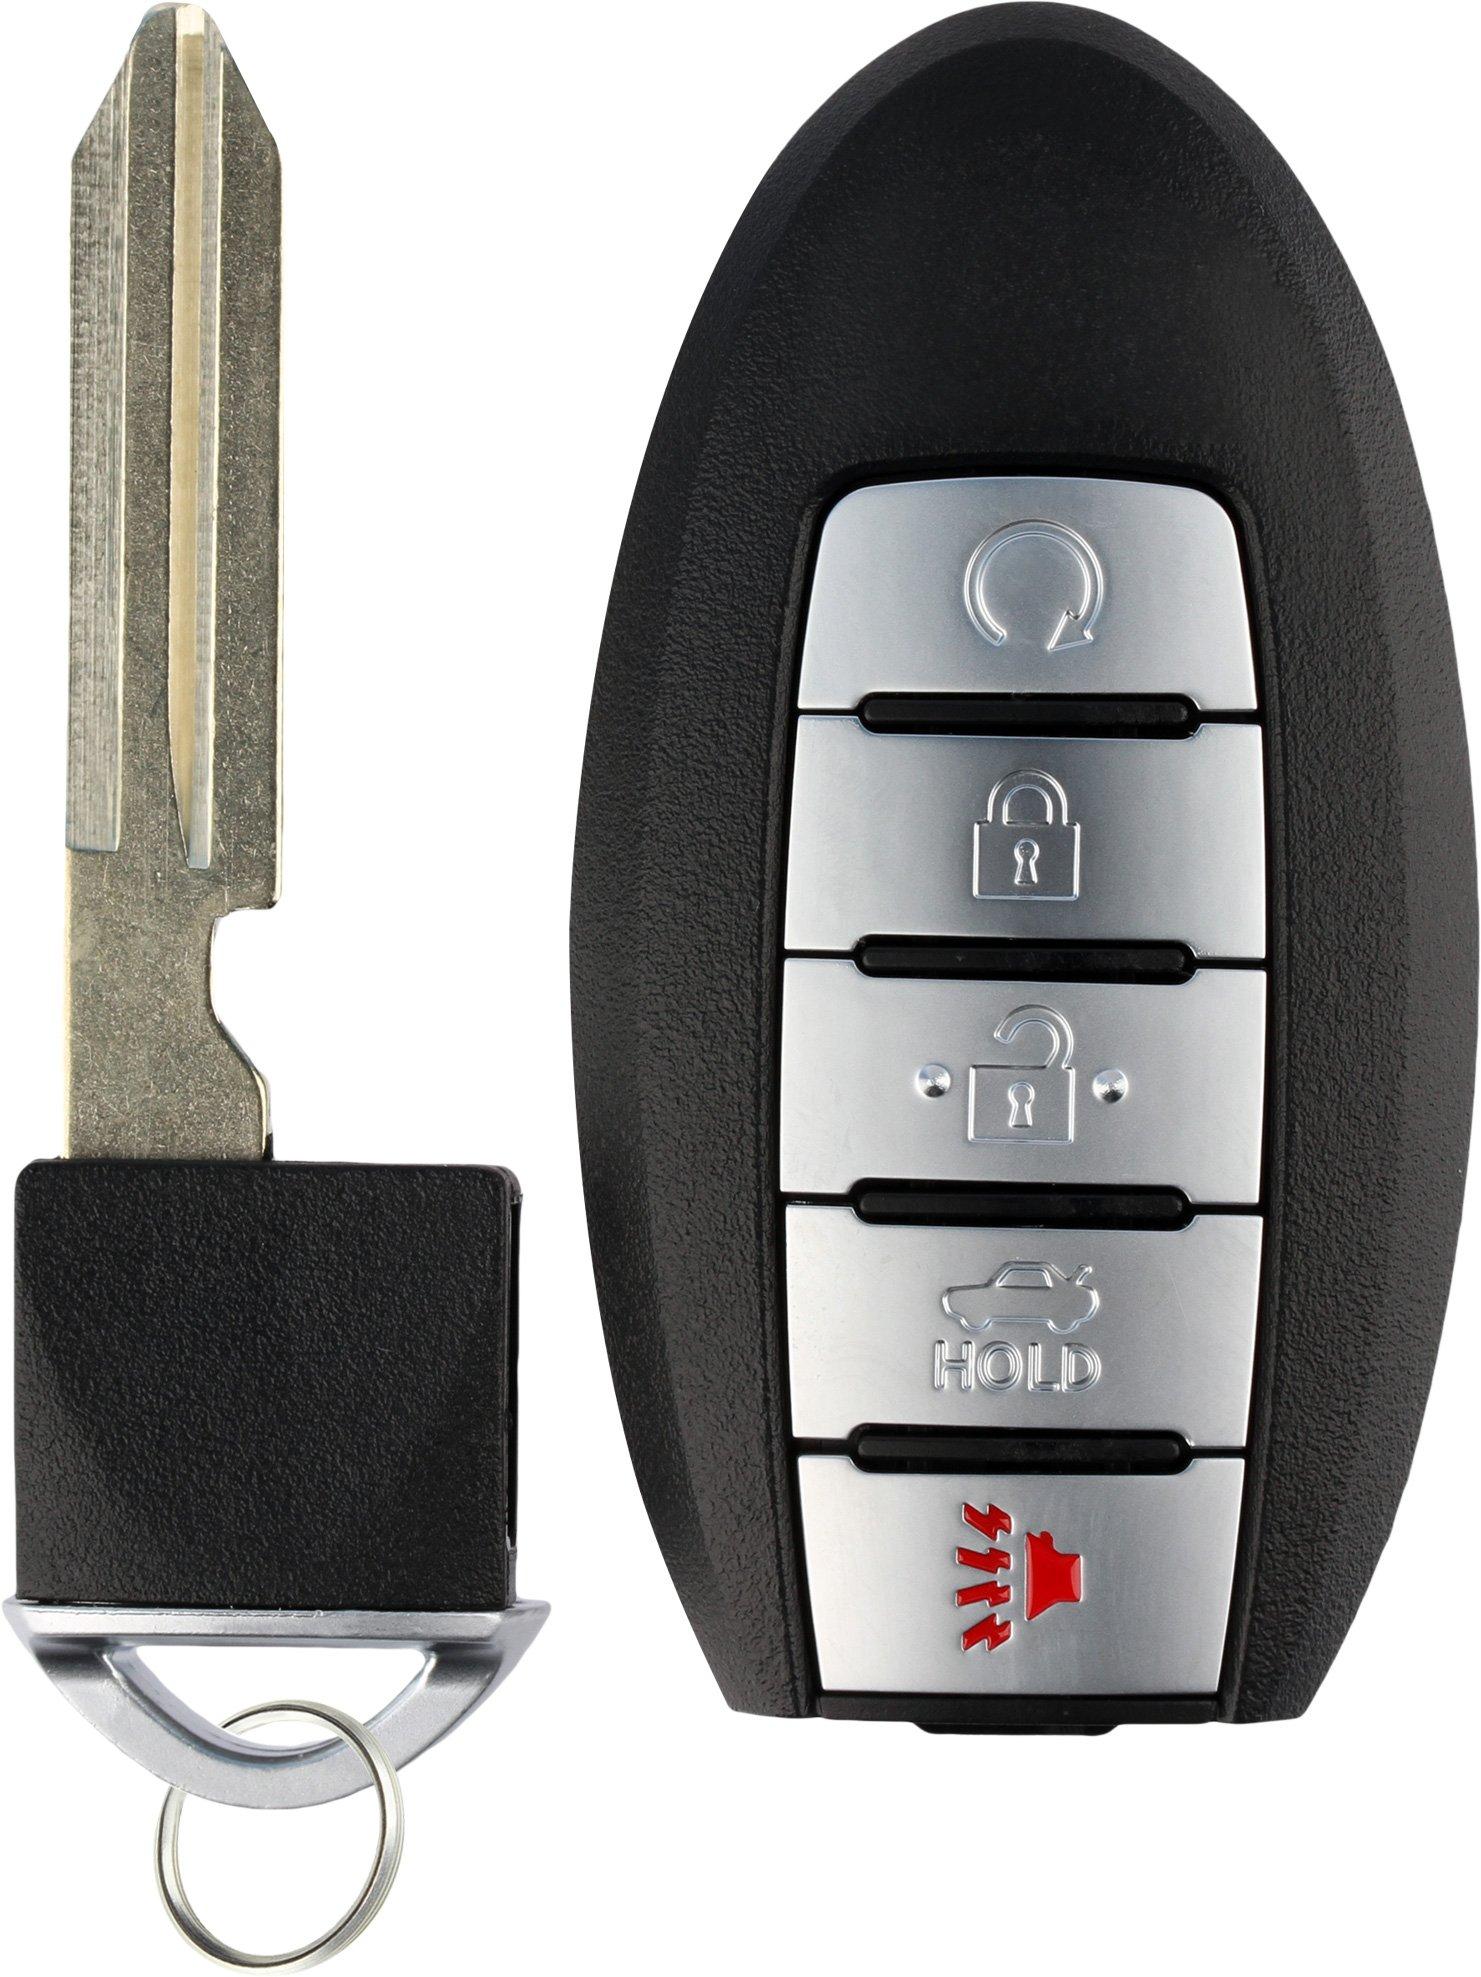 KeylessOption Keyless Entry Remote Control Starter Smart Car Key Fob Alarm for Nissan Infiniti KR5S180144014